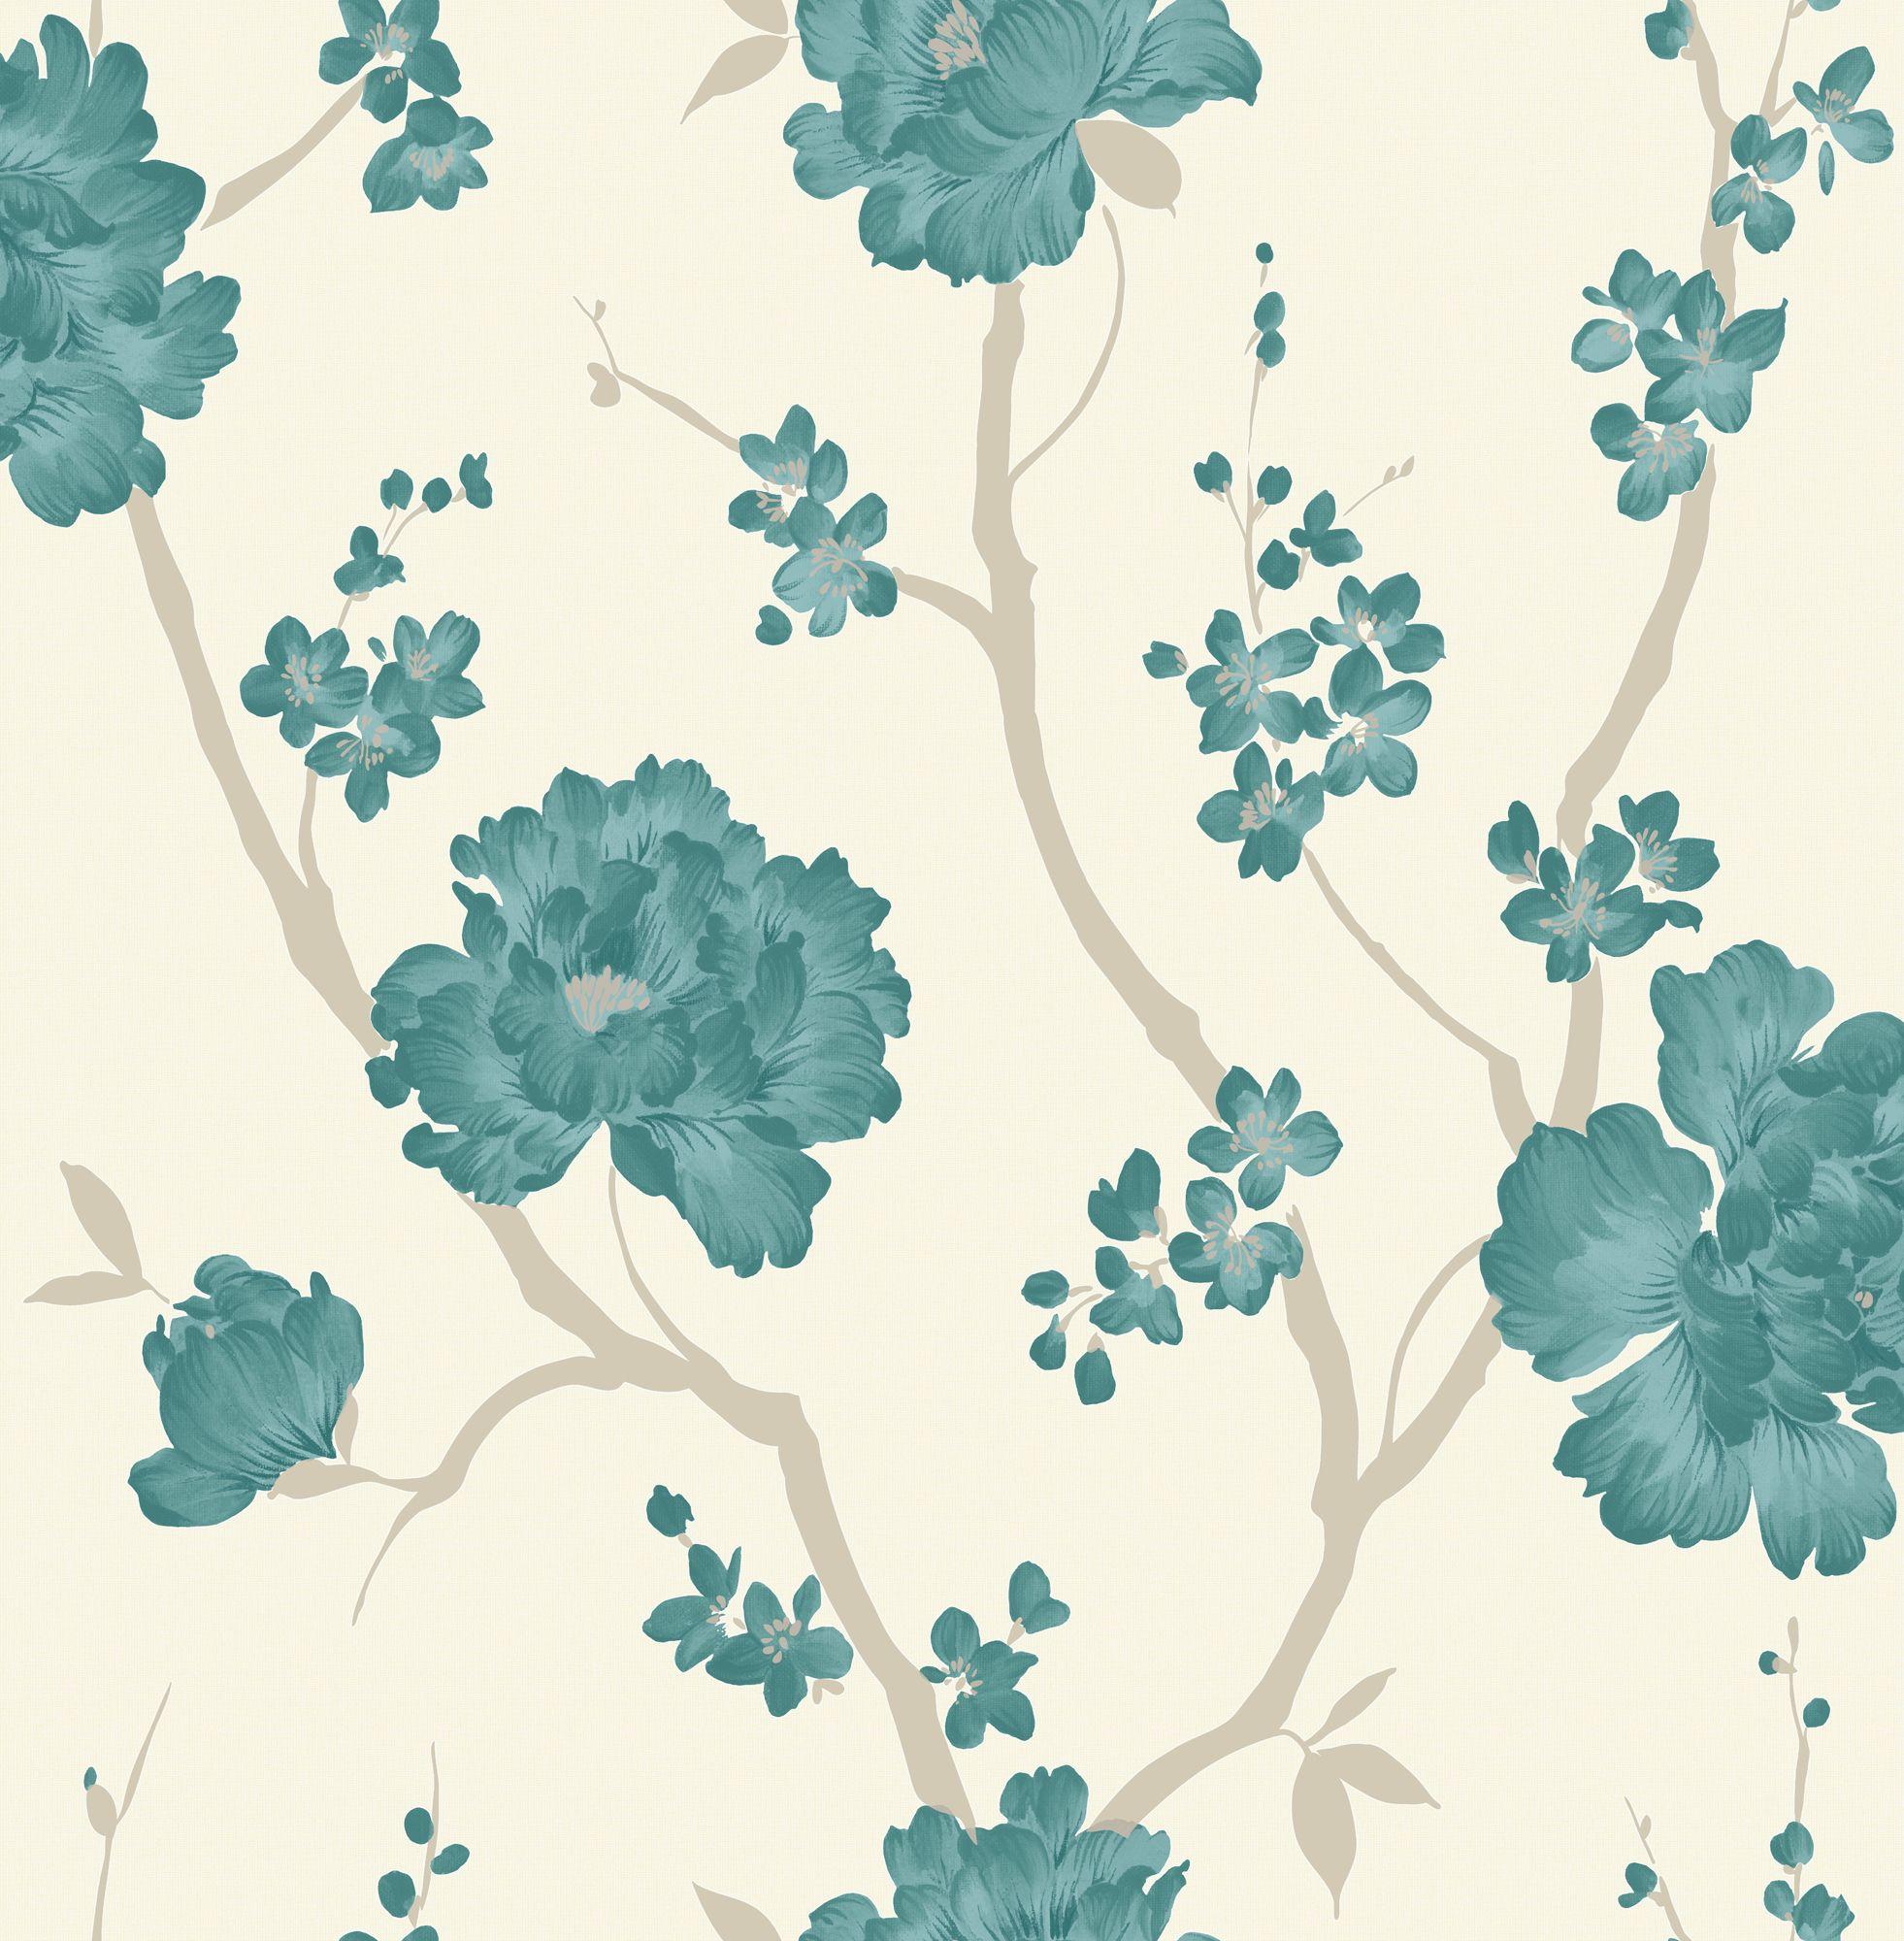 Laurence Llewelyn Bowen Love Letter Teal Floral Wallpaper